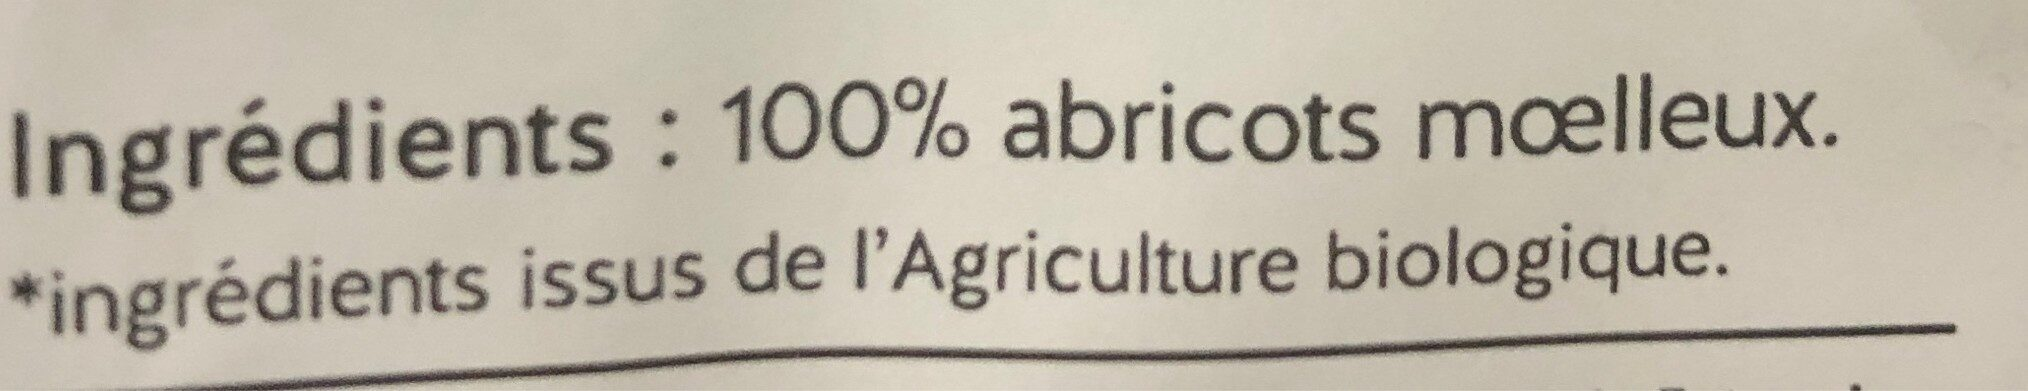 Abricots Moelleux - Ingrediënten